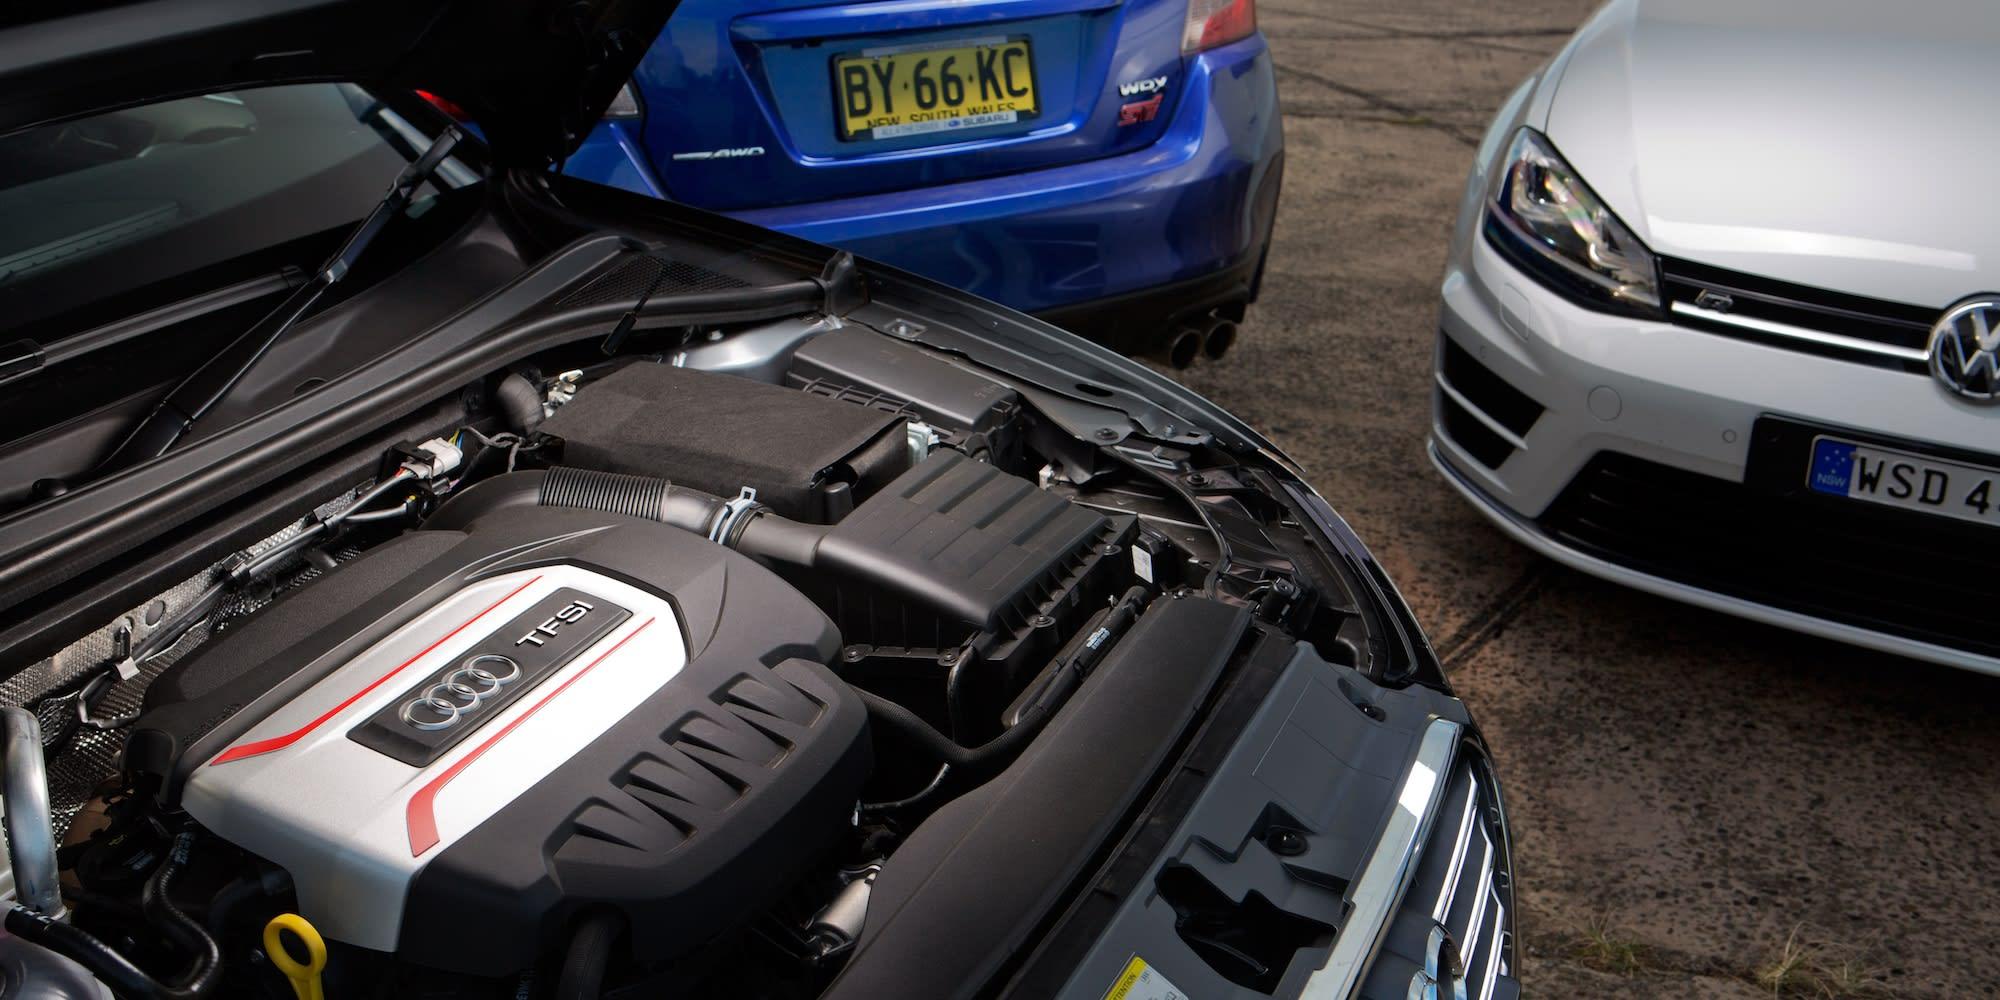 Subaru WRX STI Audi S3 Volkswagen Golf R 28